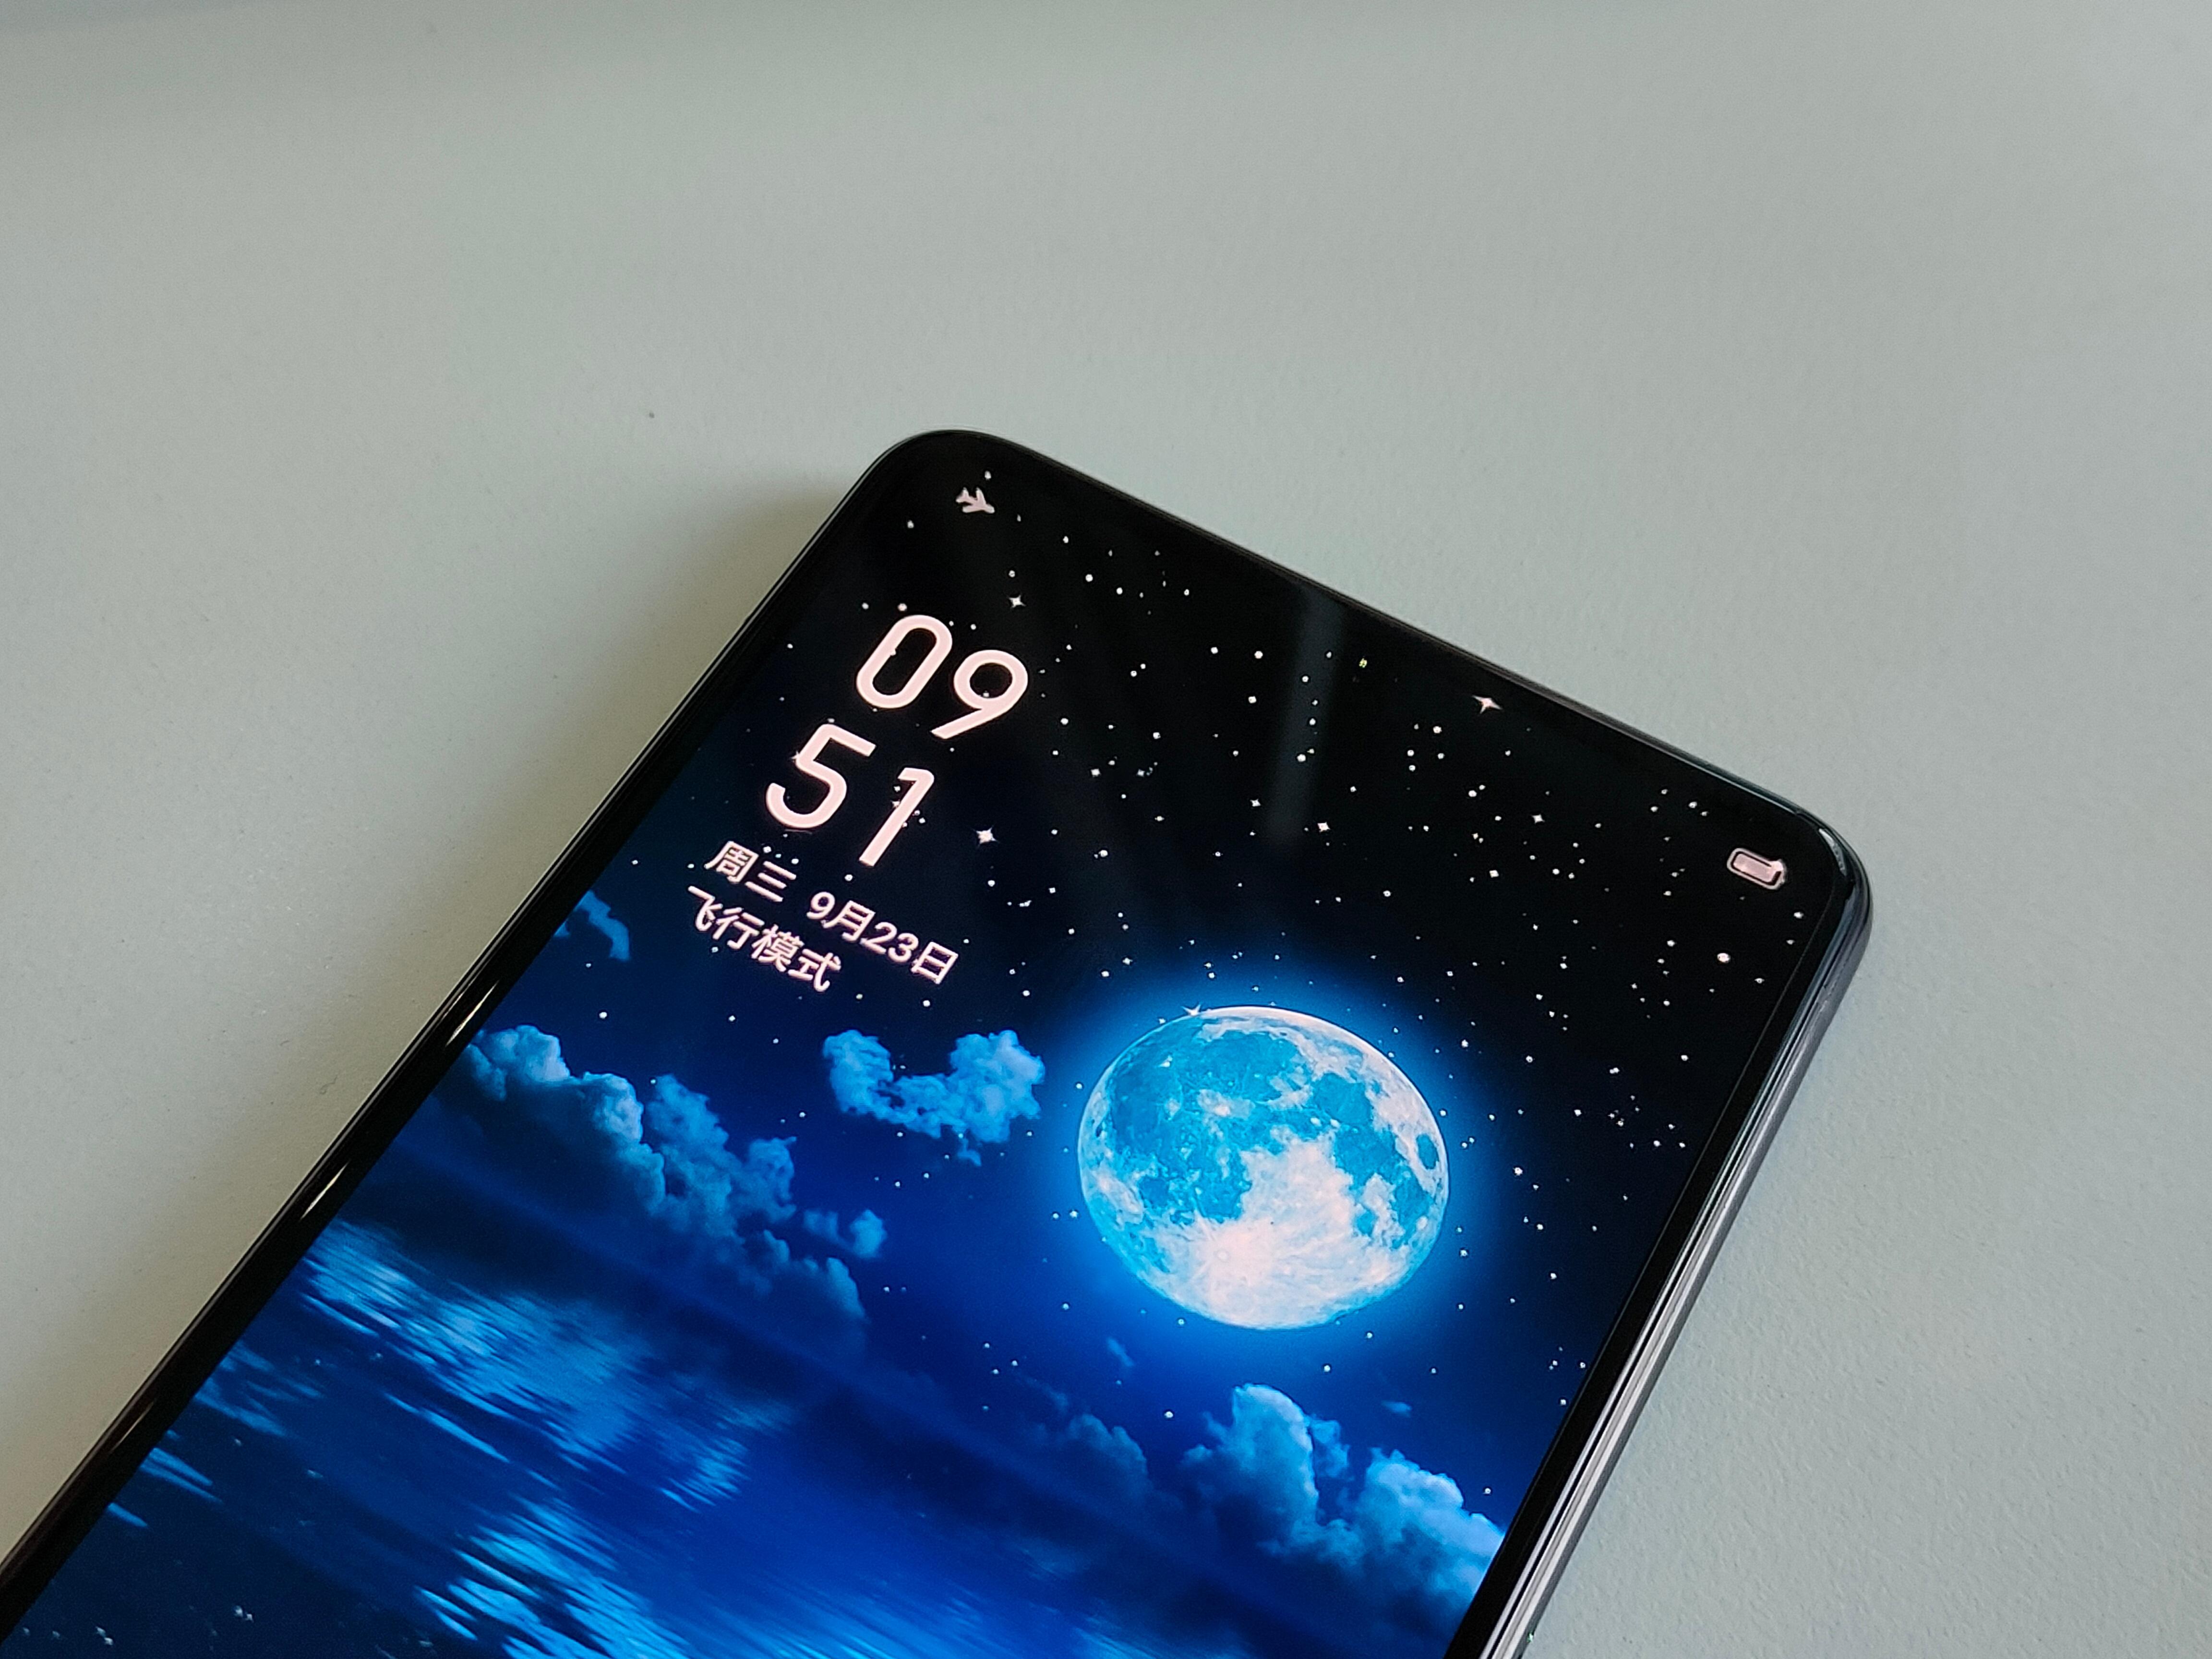 Realme создает смартфон с подэкранной камерой Другие устройства  - buduschee_radom_realme_gotovit_svoj_smartfon_s_podekrannoj_kameroj_picture2_0